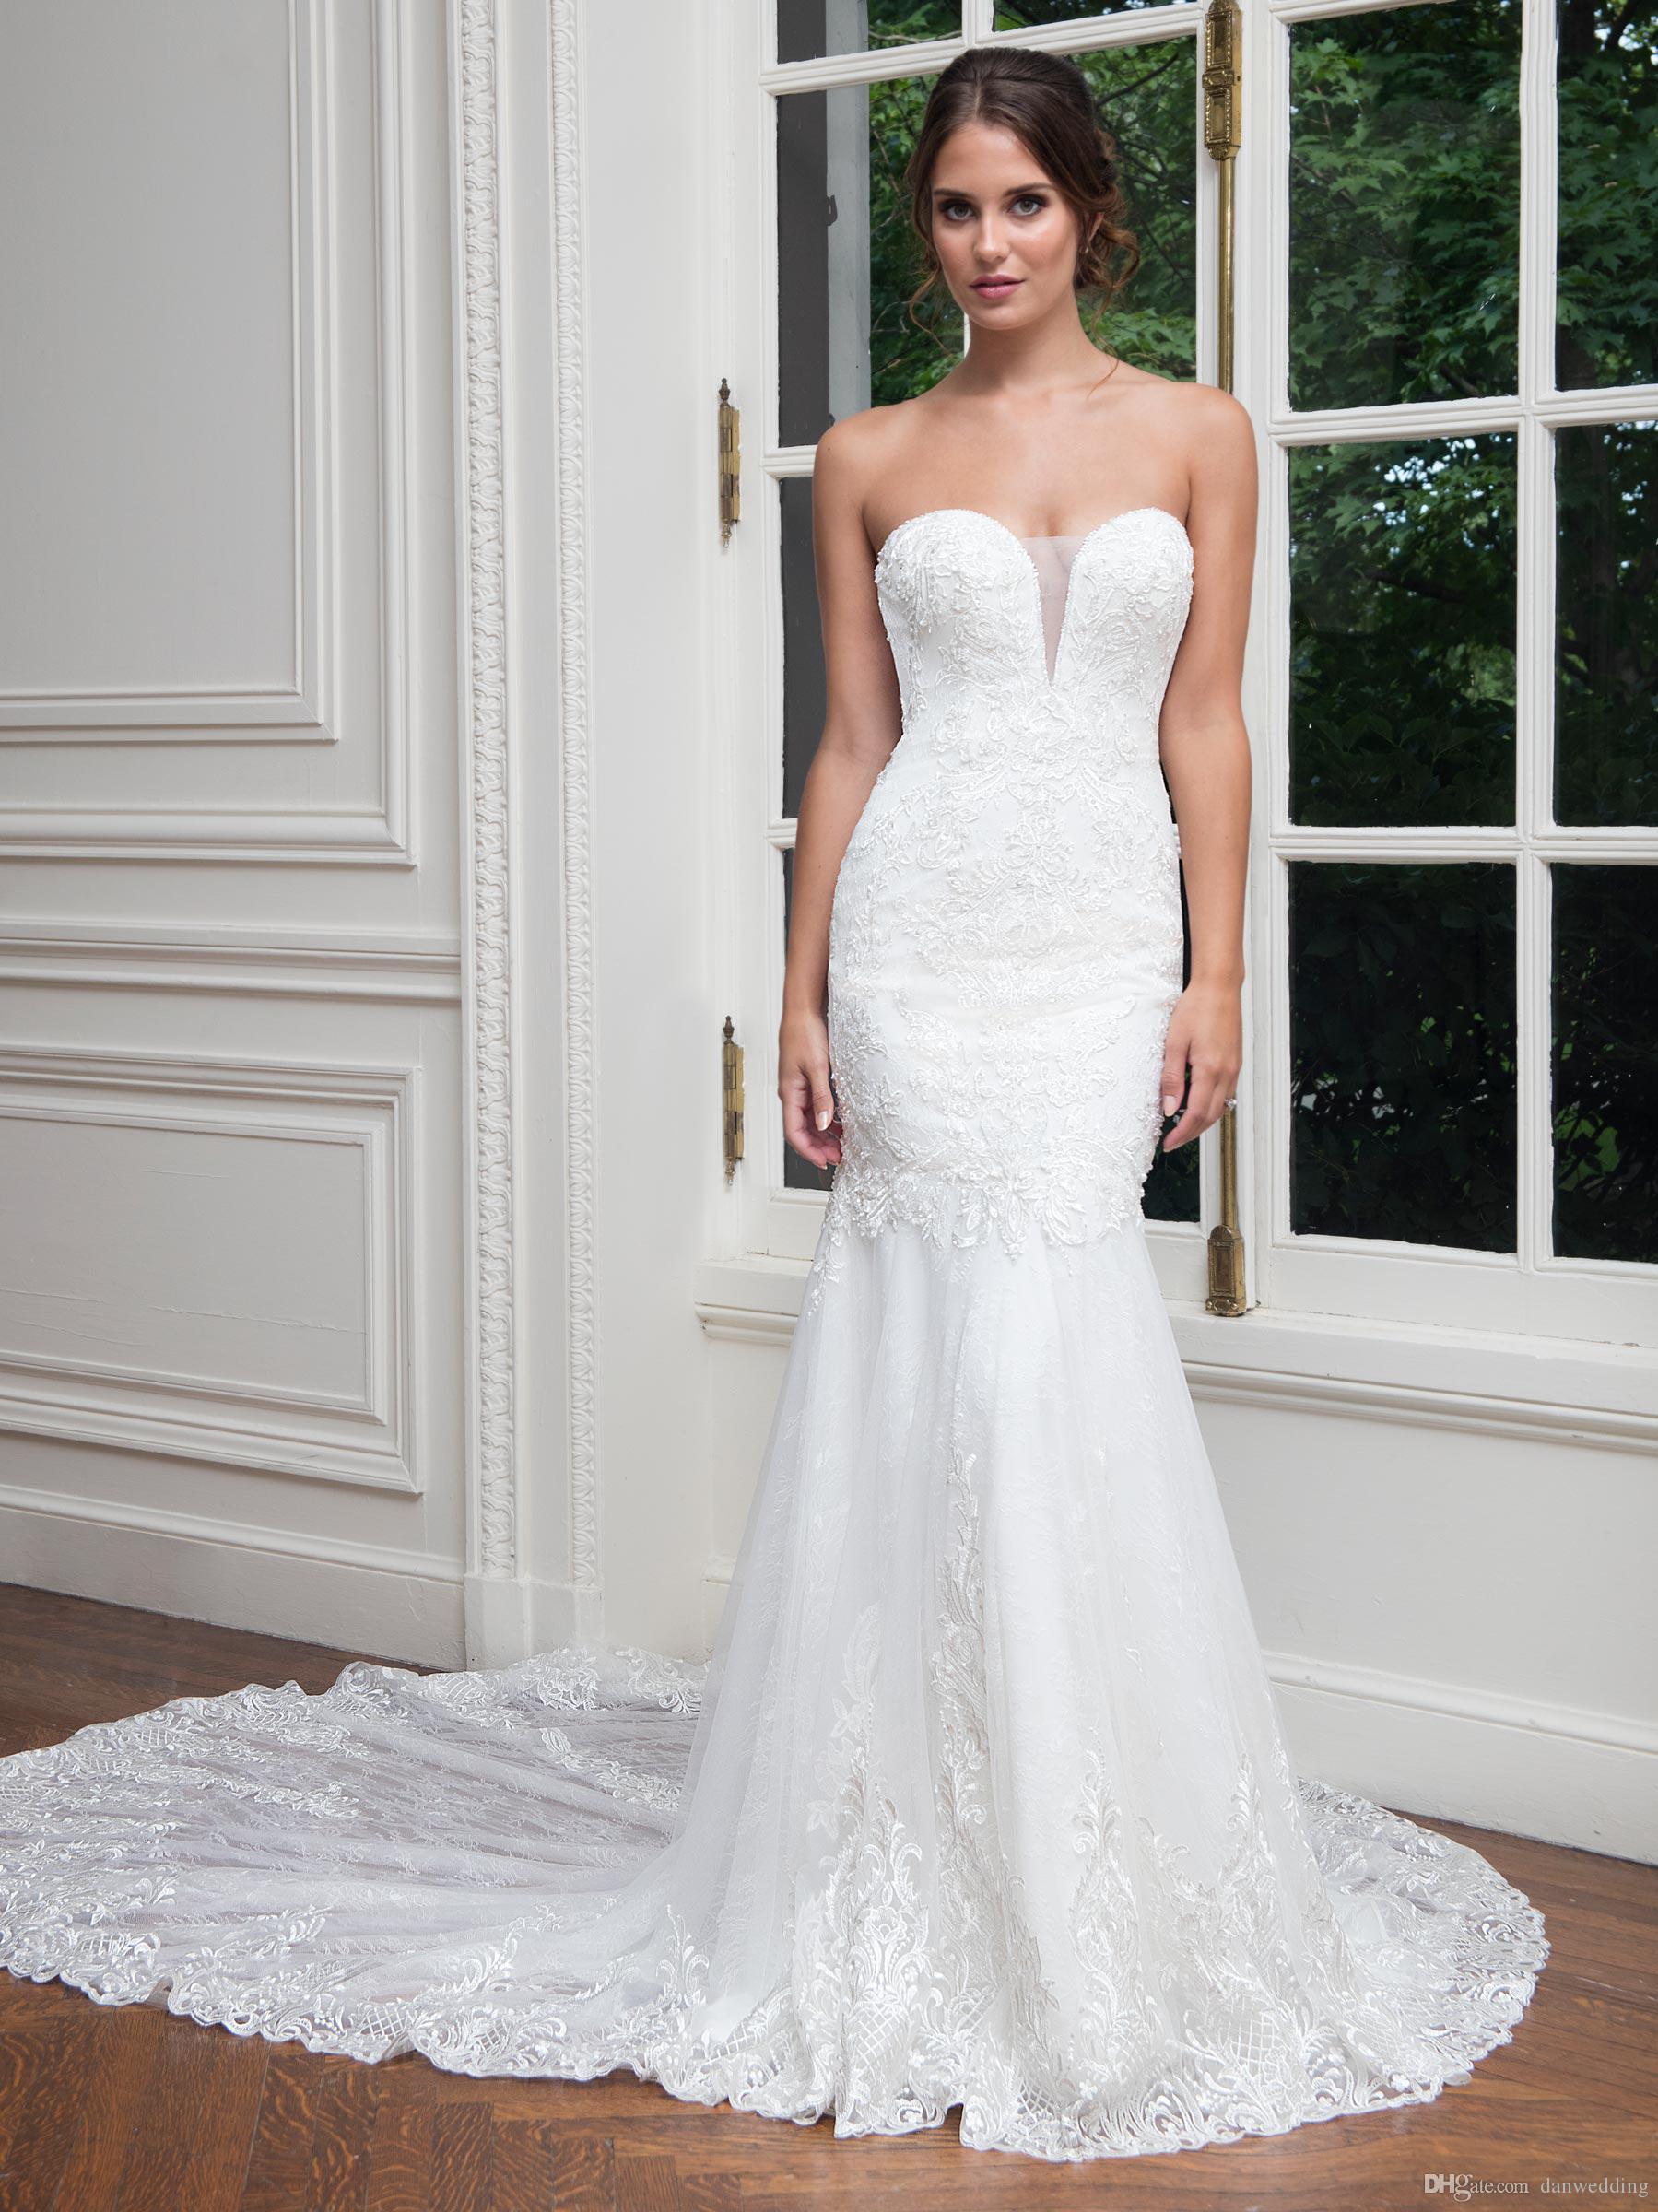 Noble White Ivory Sweetheart Applique Beads Mermaid Wedding Dresses Bridal Pageant Dresses Wedding Attire Dresses Custom Size 2-18 KF1219233